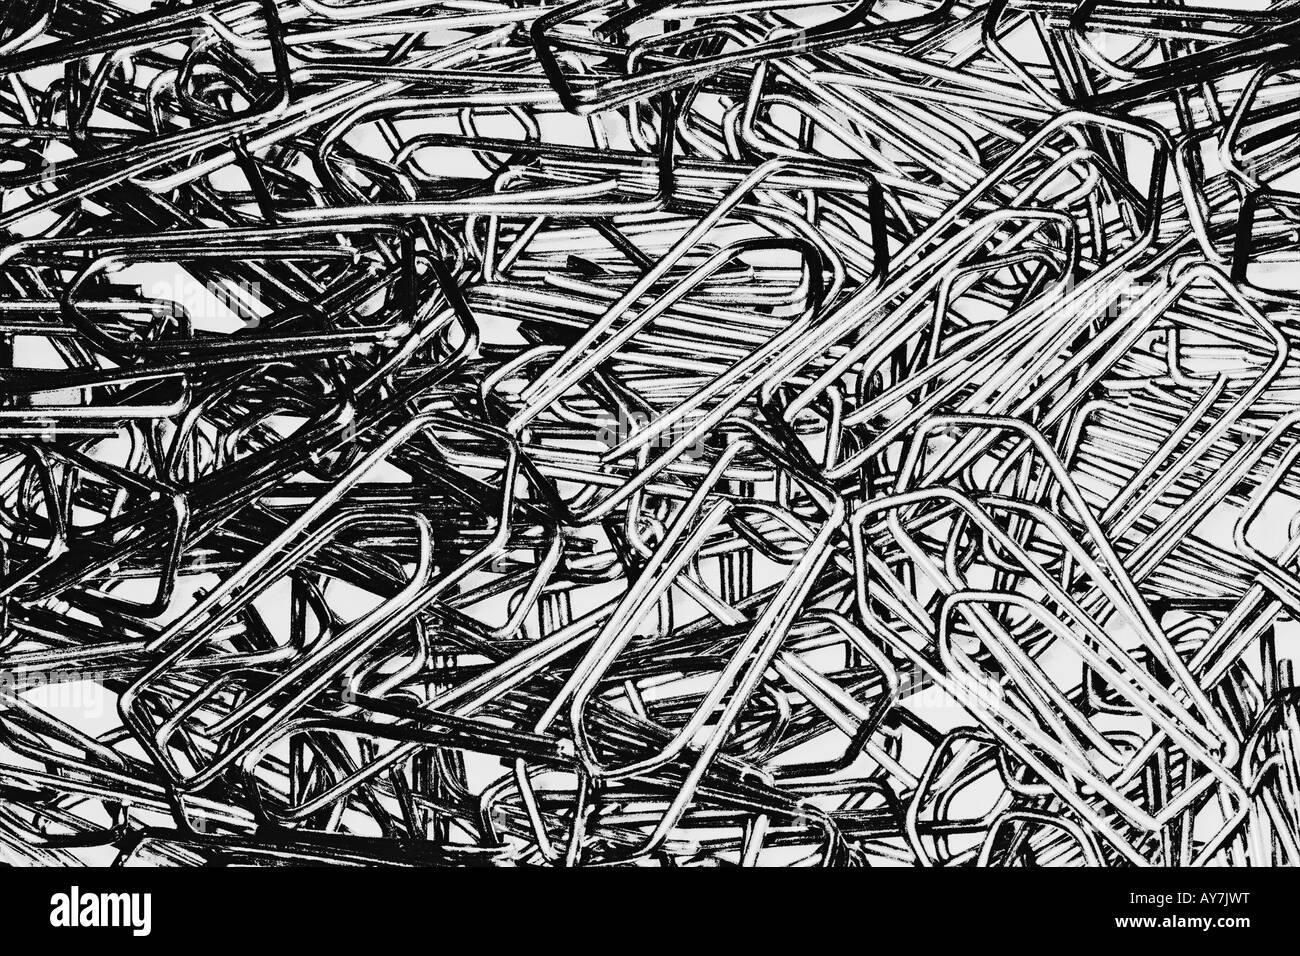 Gran grupo de clips de papel Imagen De Stock